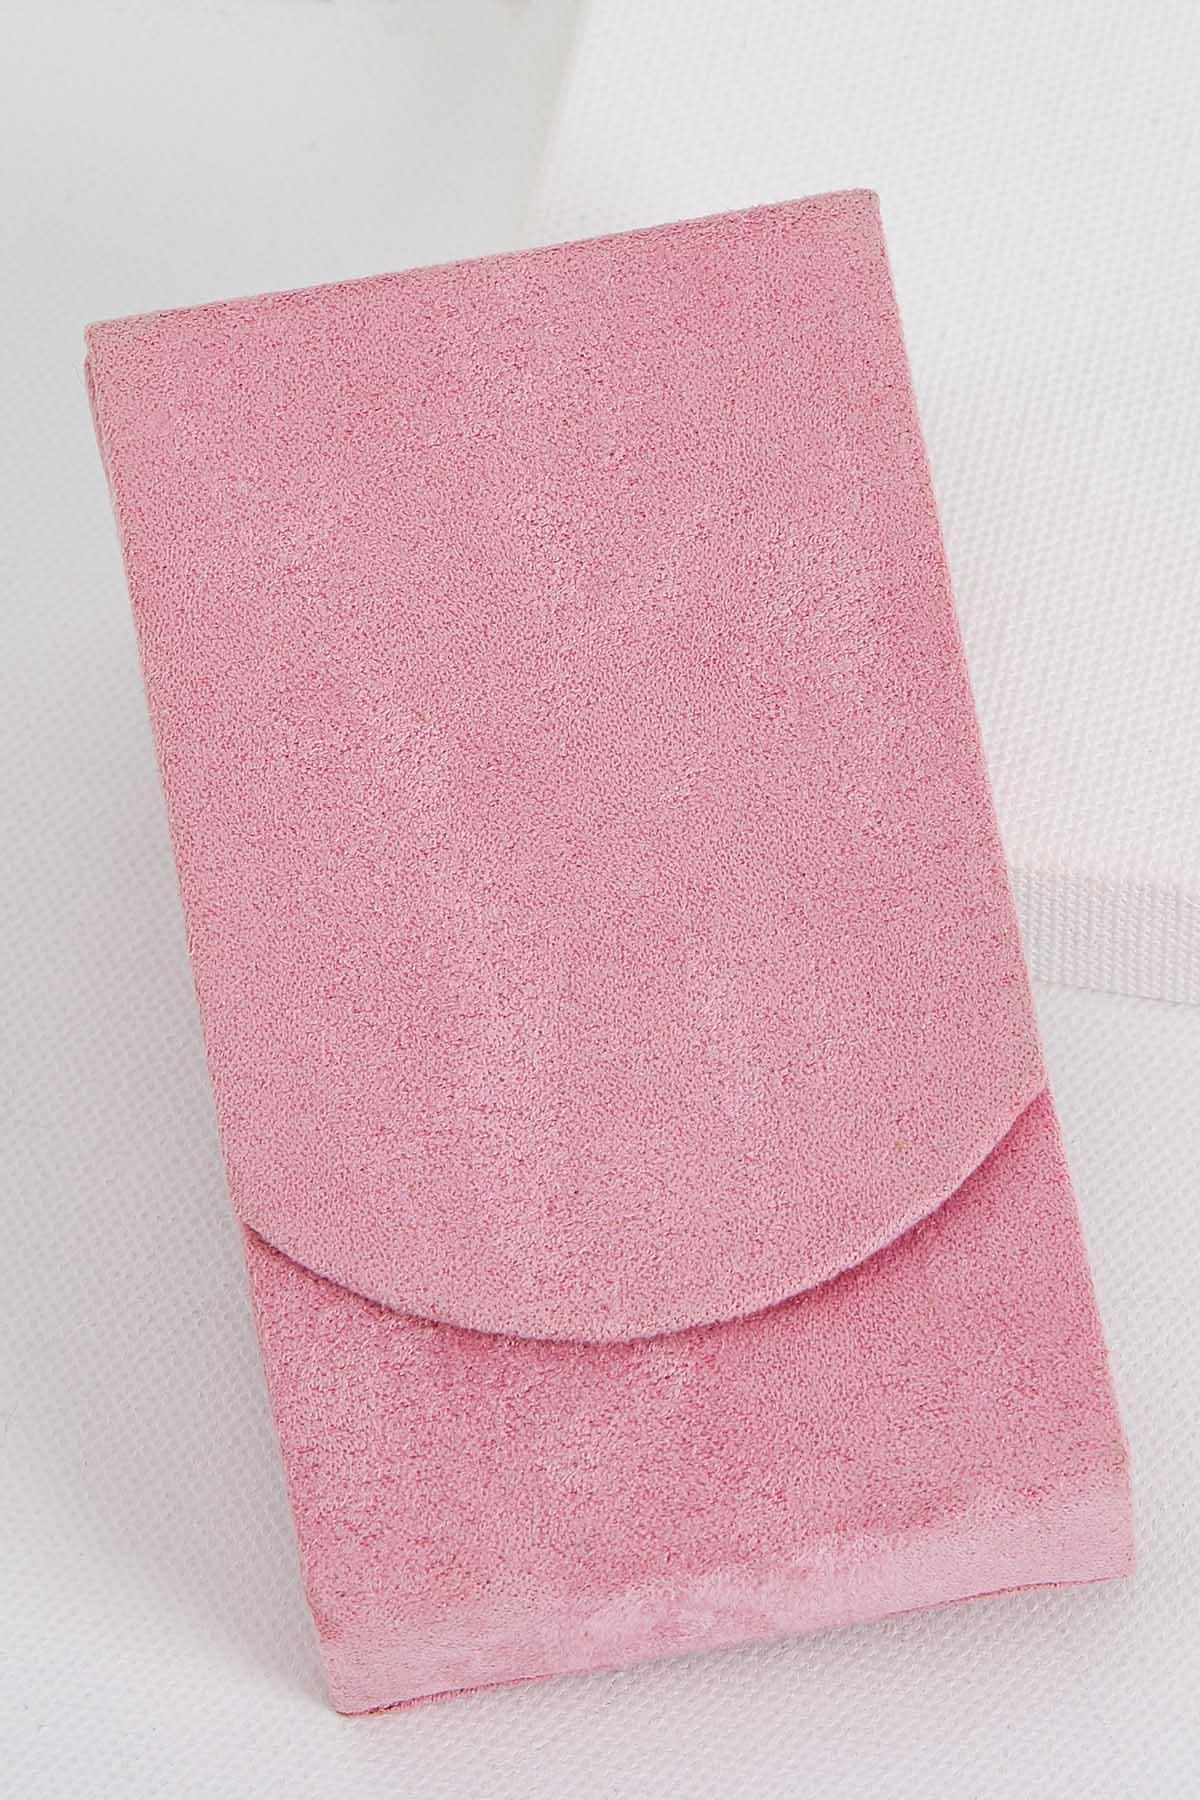 Faux Suede Tissue Holder